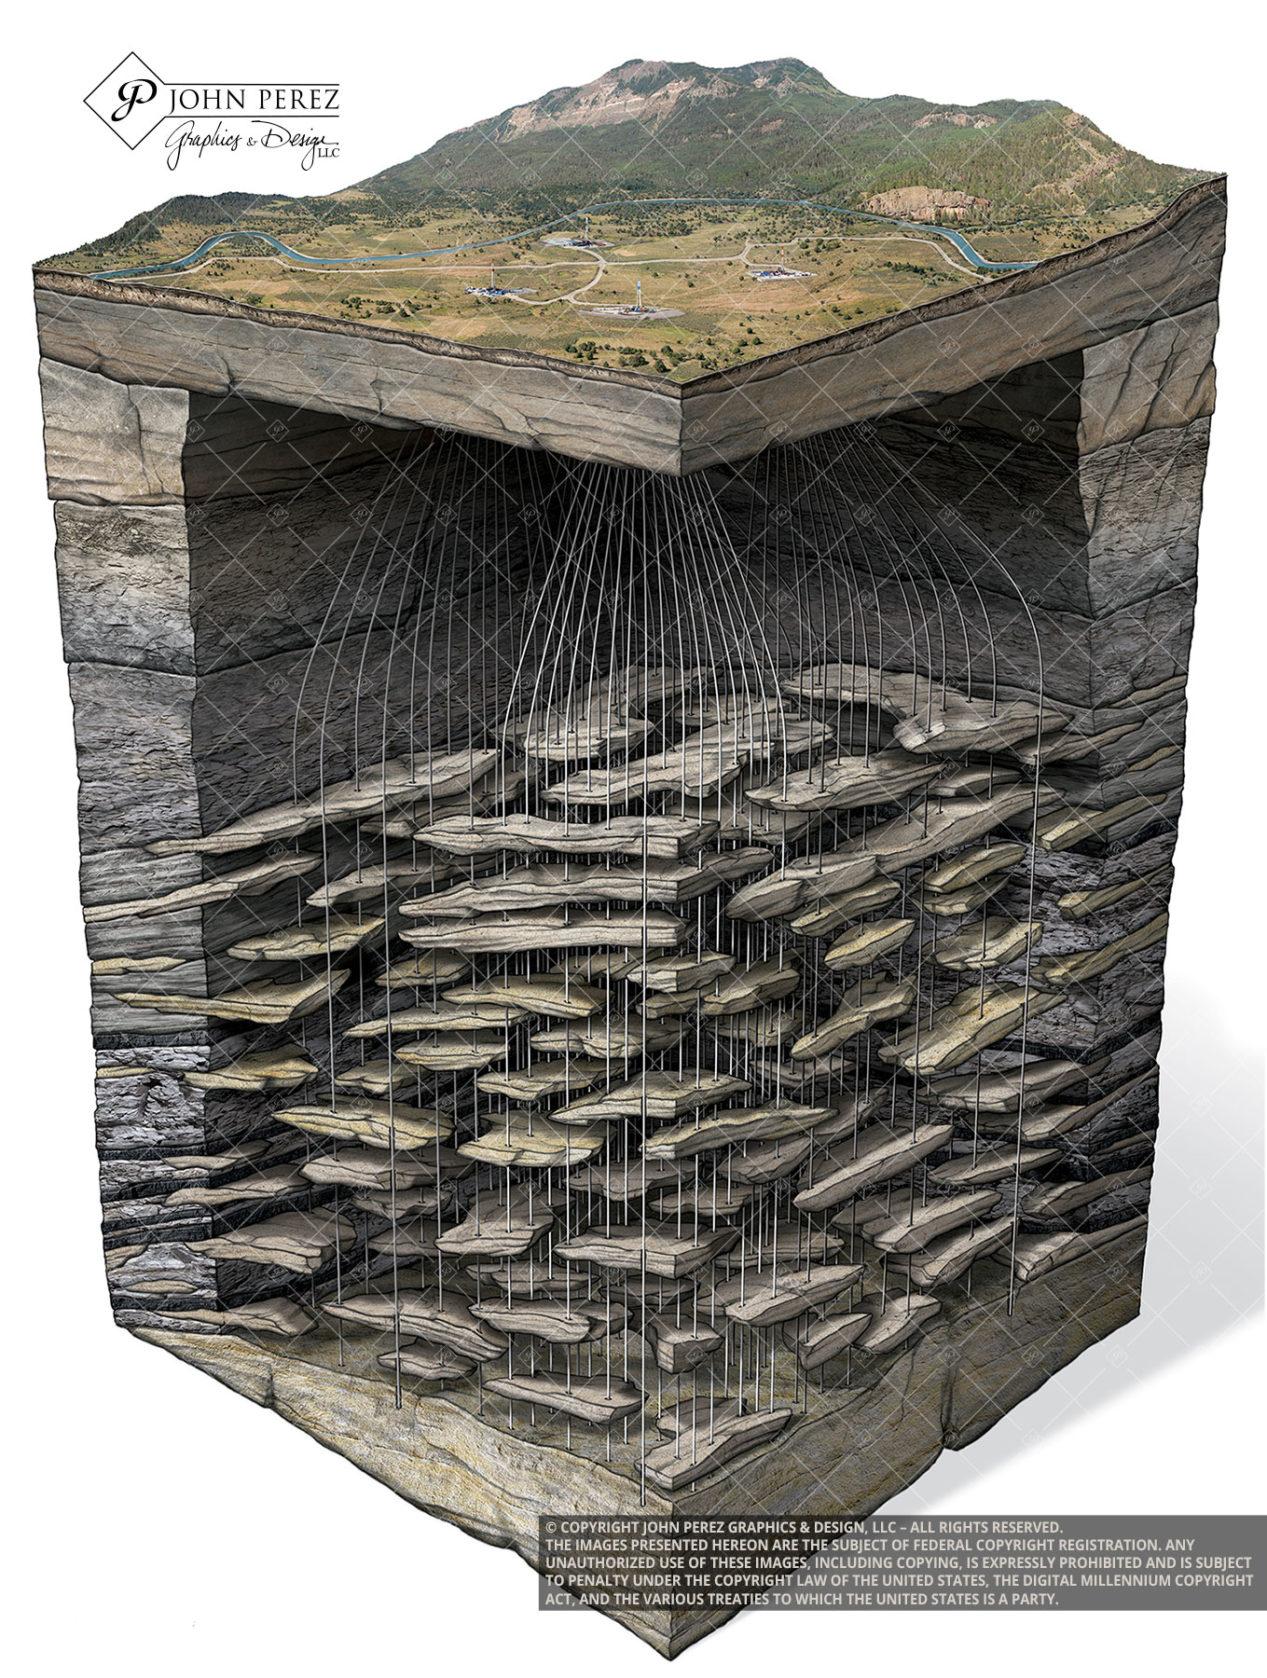 Piceance Basin Oil Gas Schematic Illustration, john perez graphics, geologic art